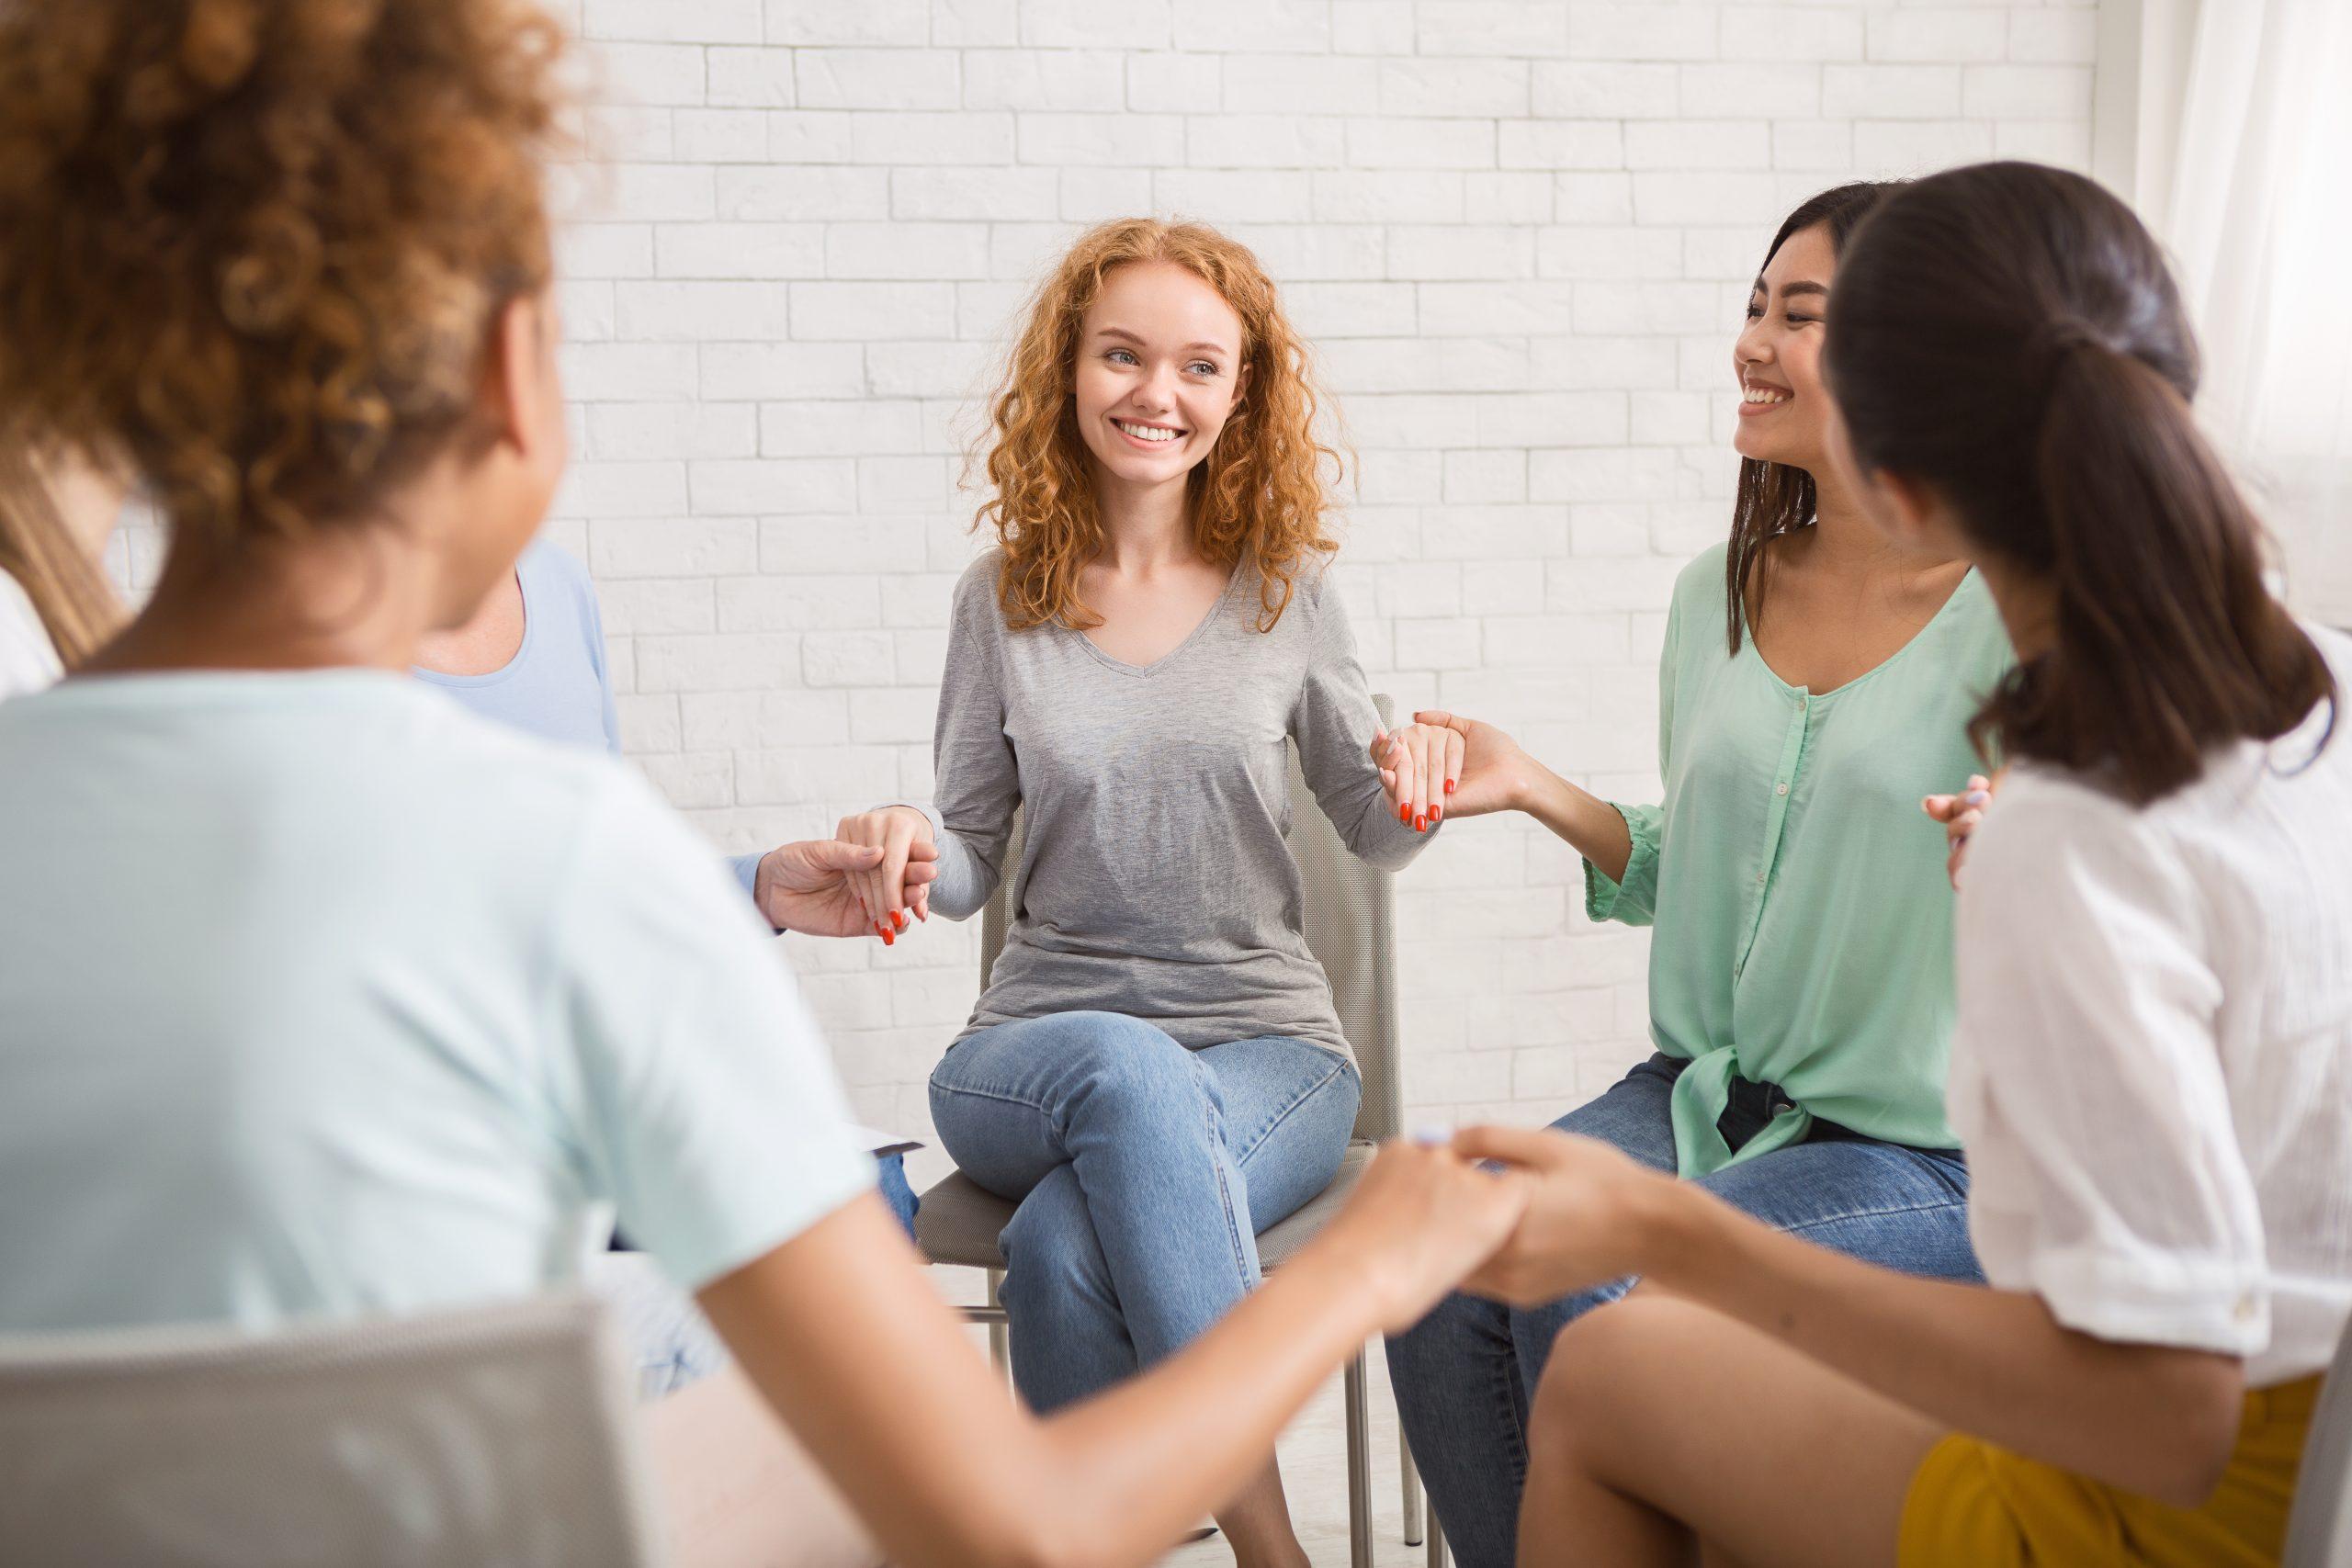 Diverse Girls Smiling Holding Hands Sitting Indoor